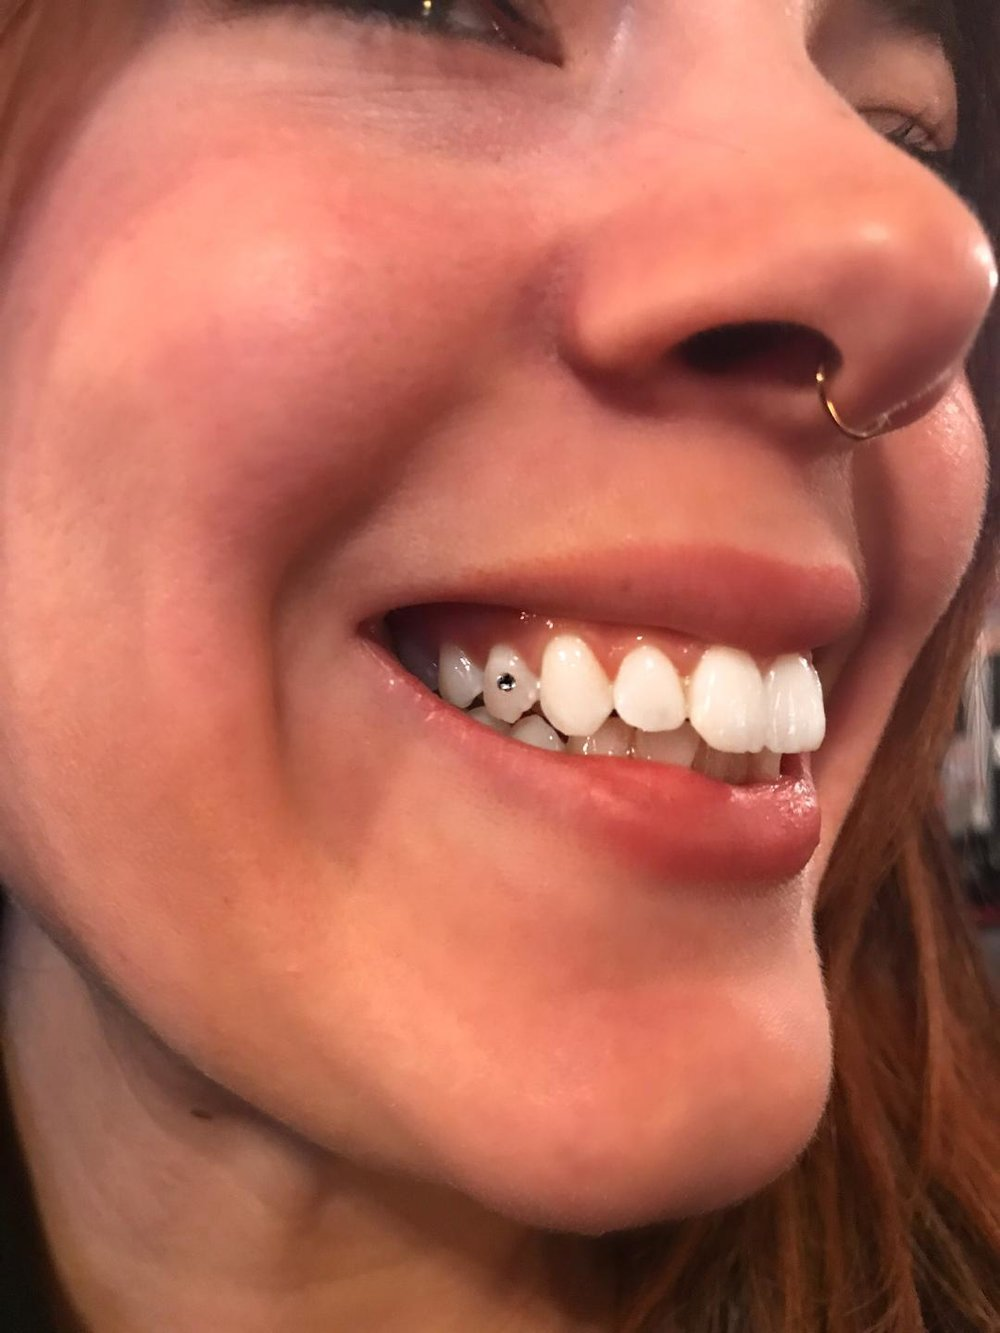 tooth.jpeg